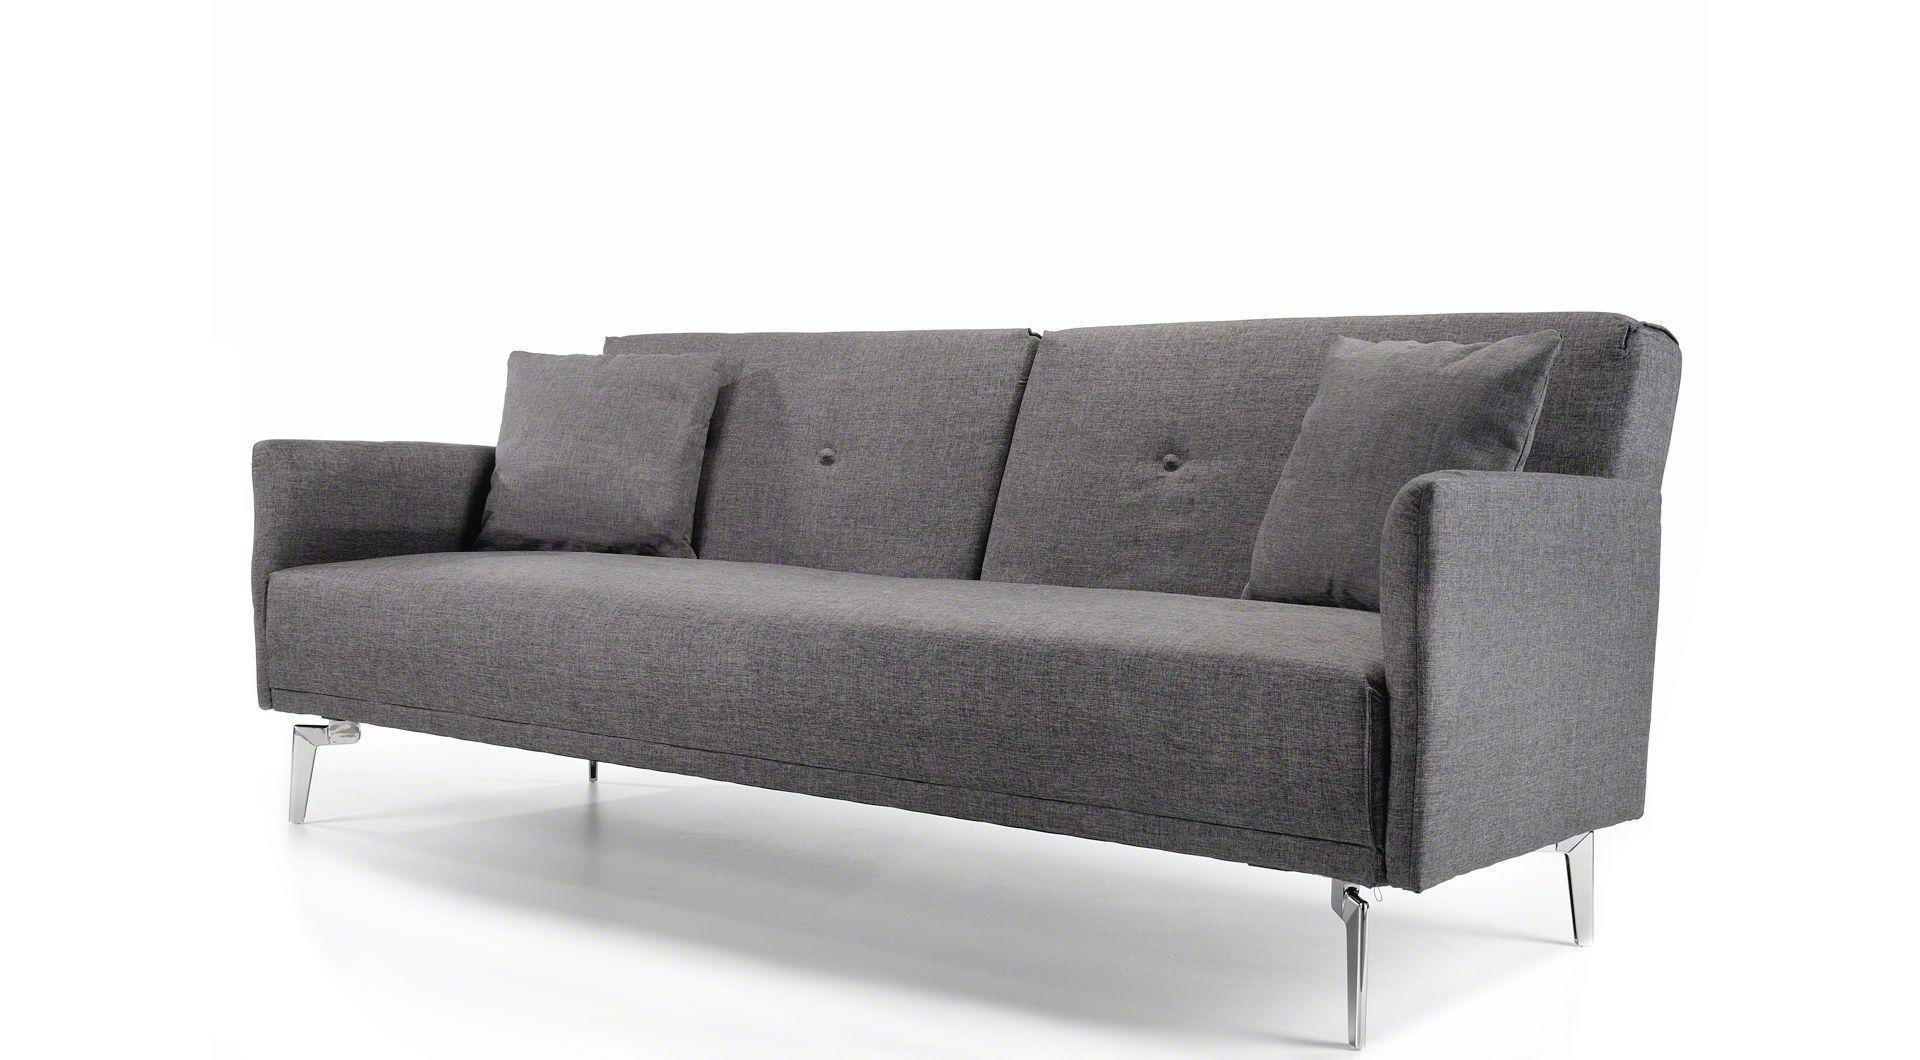 dalton sofa bed how to make sheets sofabed grey mysmallspace